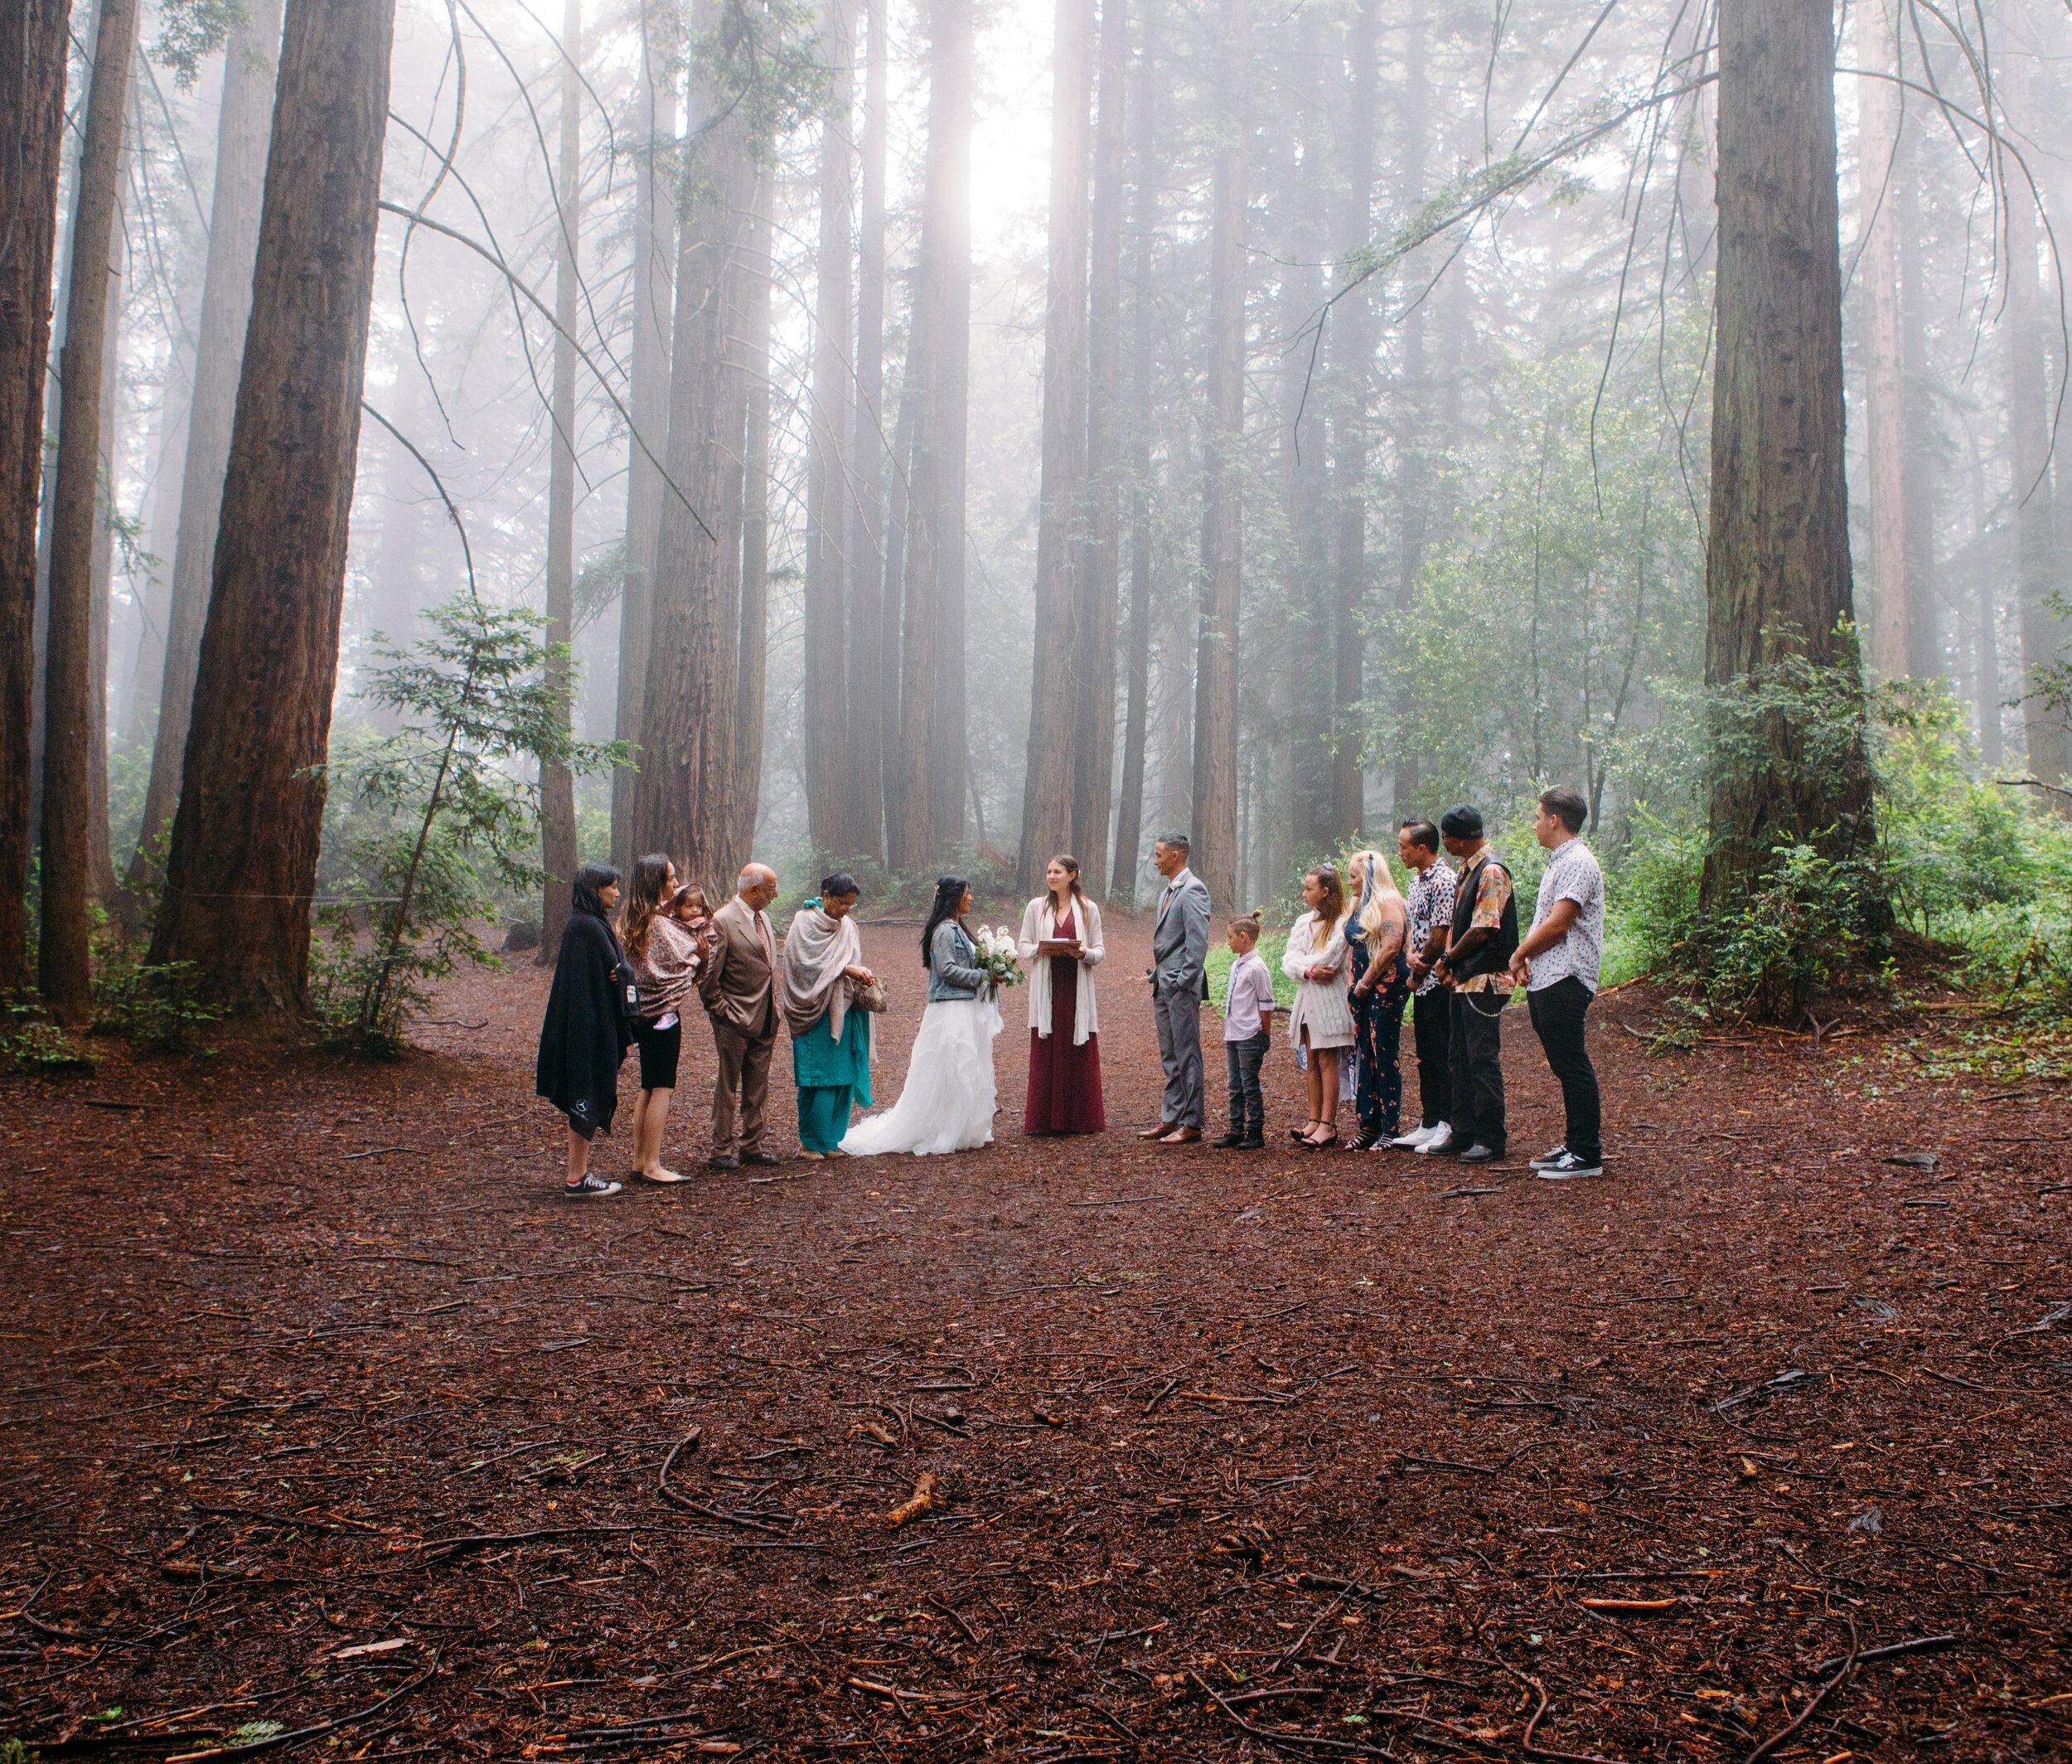 20190615-SanFrancisco-Redwood Regional-Vishali Kameron--14.jpg